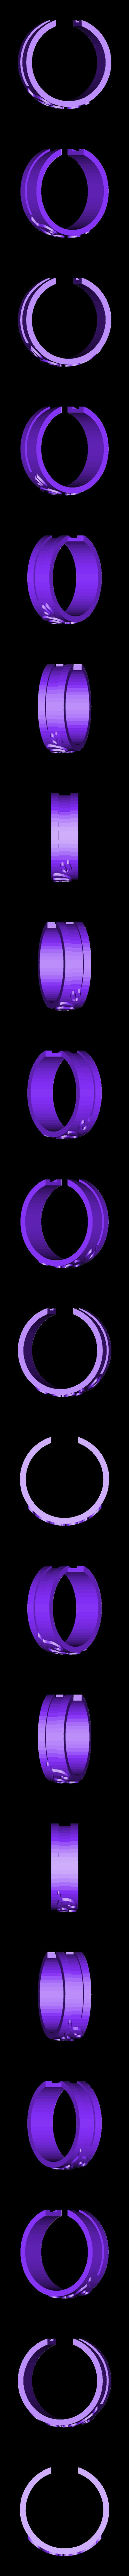 anillo love 20 abierto hendidura.stl Télécharger fichier STL gratuit Anillo / Ring Love • Design pour impression 3D, amg3D